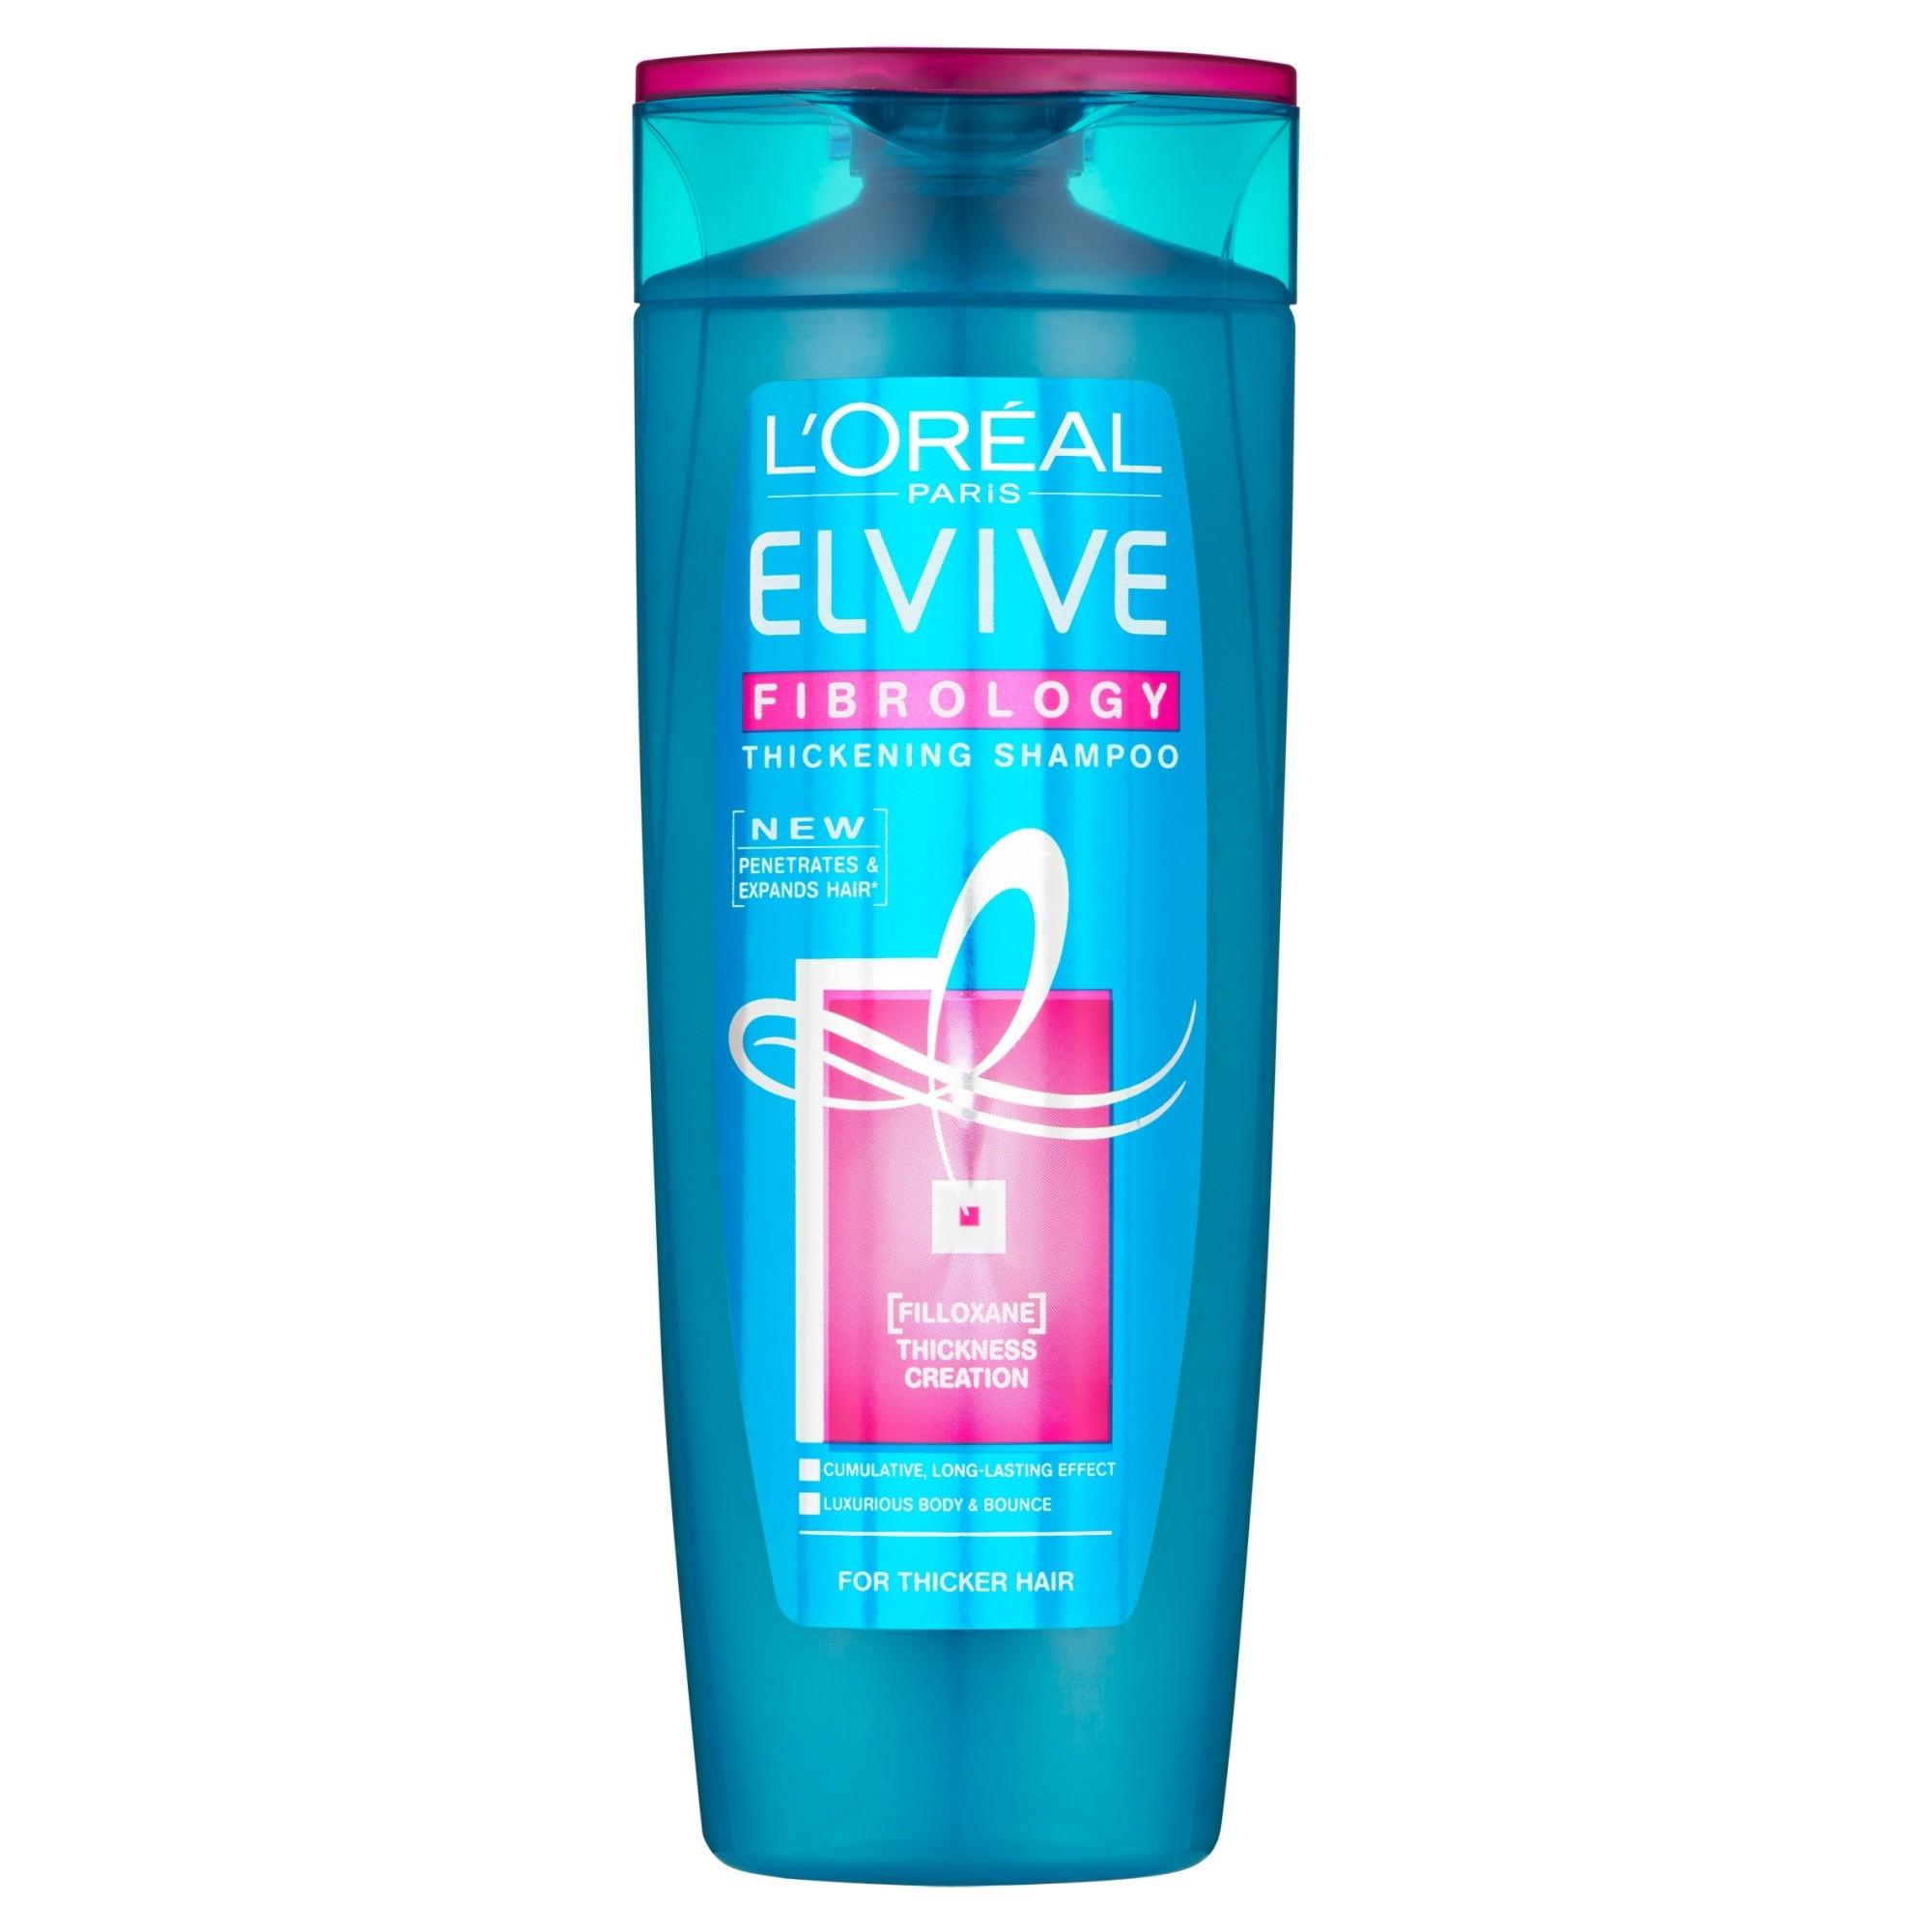 L'Oreal Paris Elvive Fibrology Thickening Shampoo